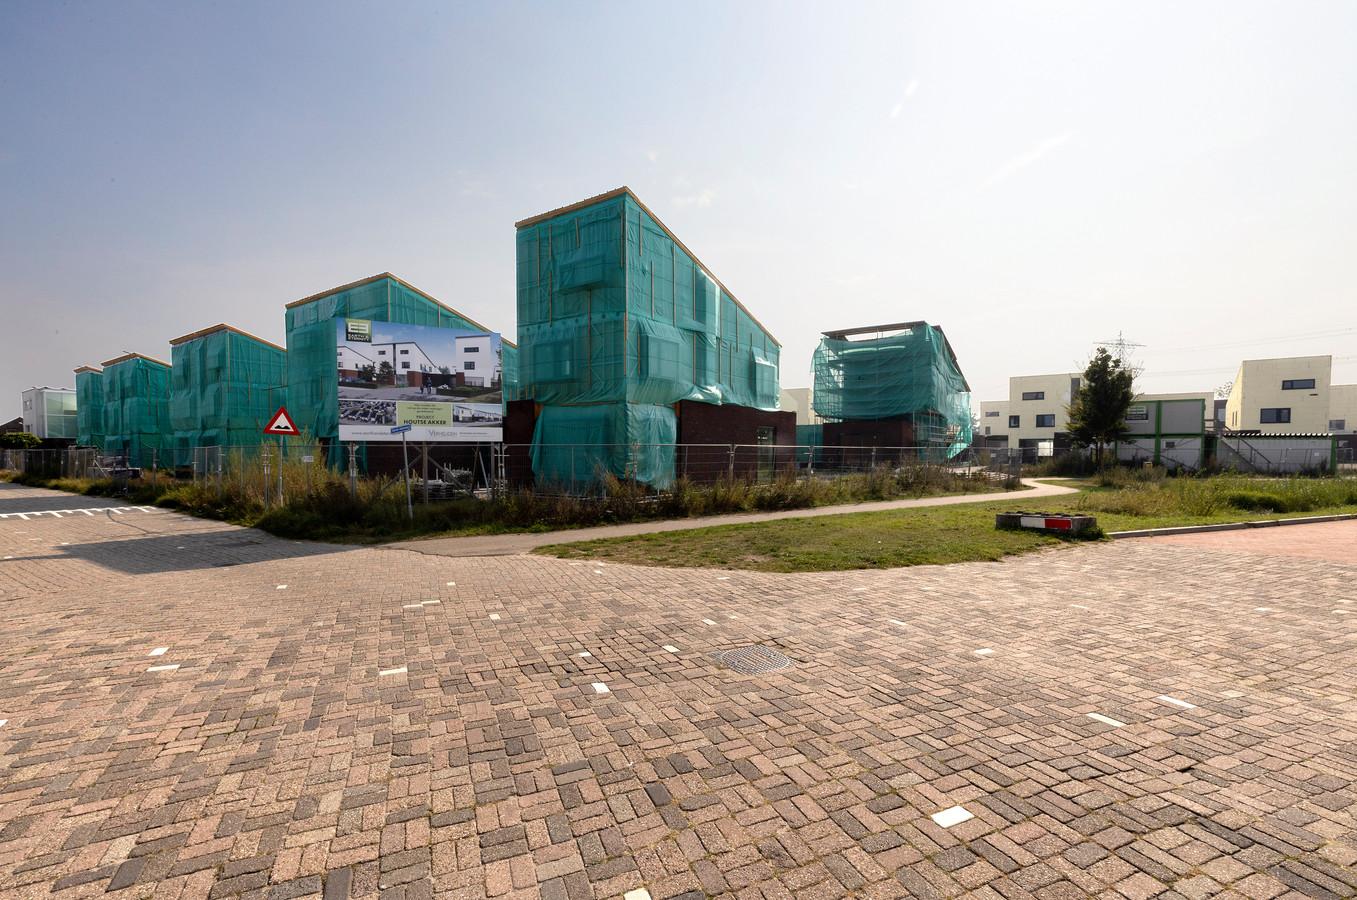 De niet-voltooide woningen in het project Houtse Akker in Helmond.